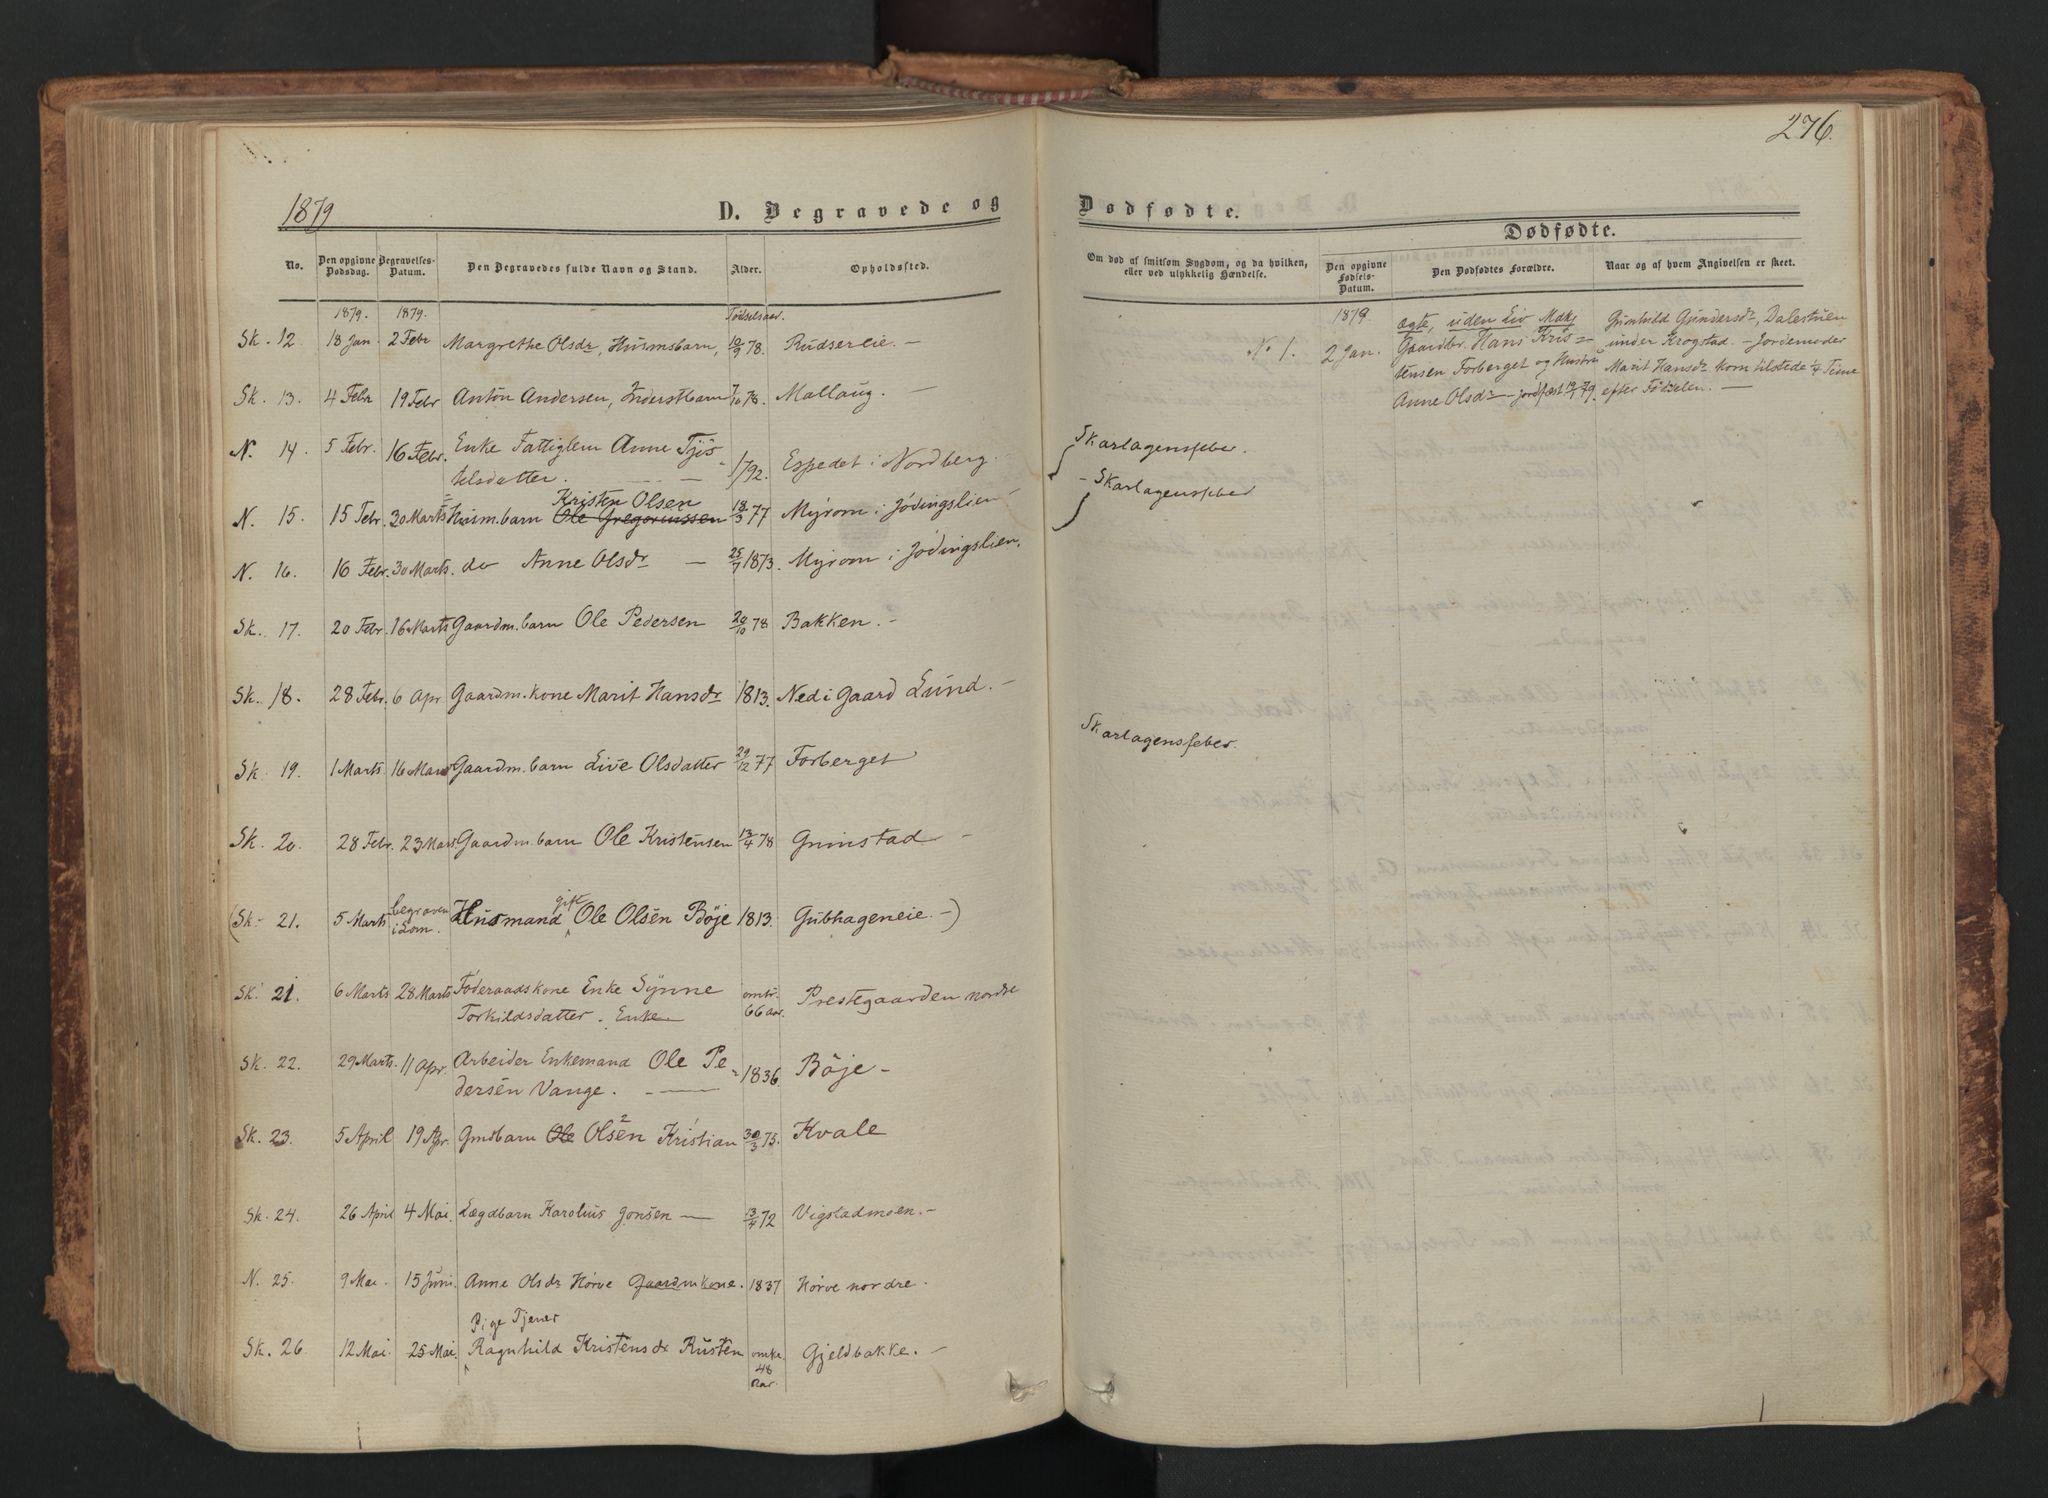 SAH, Skjåk prestekontor, Ministerialbok nr. 1, 1863-1879, s. 276